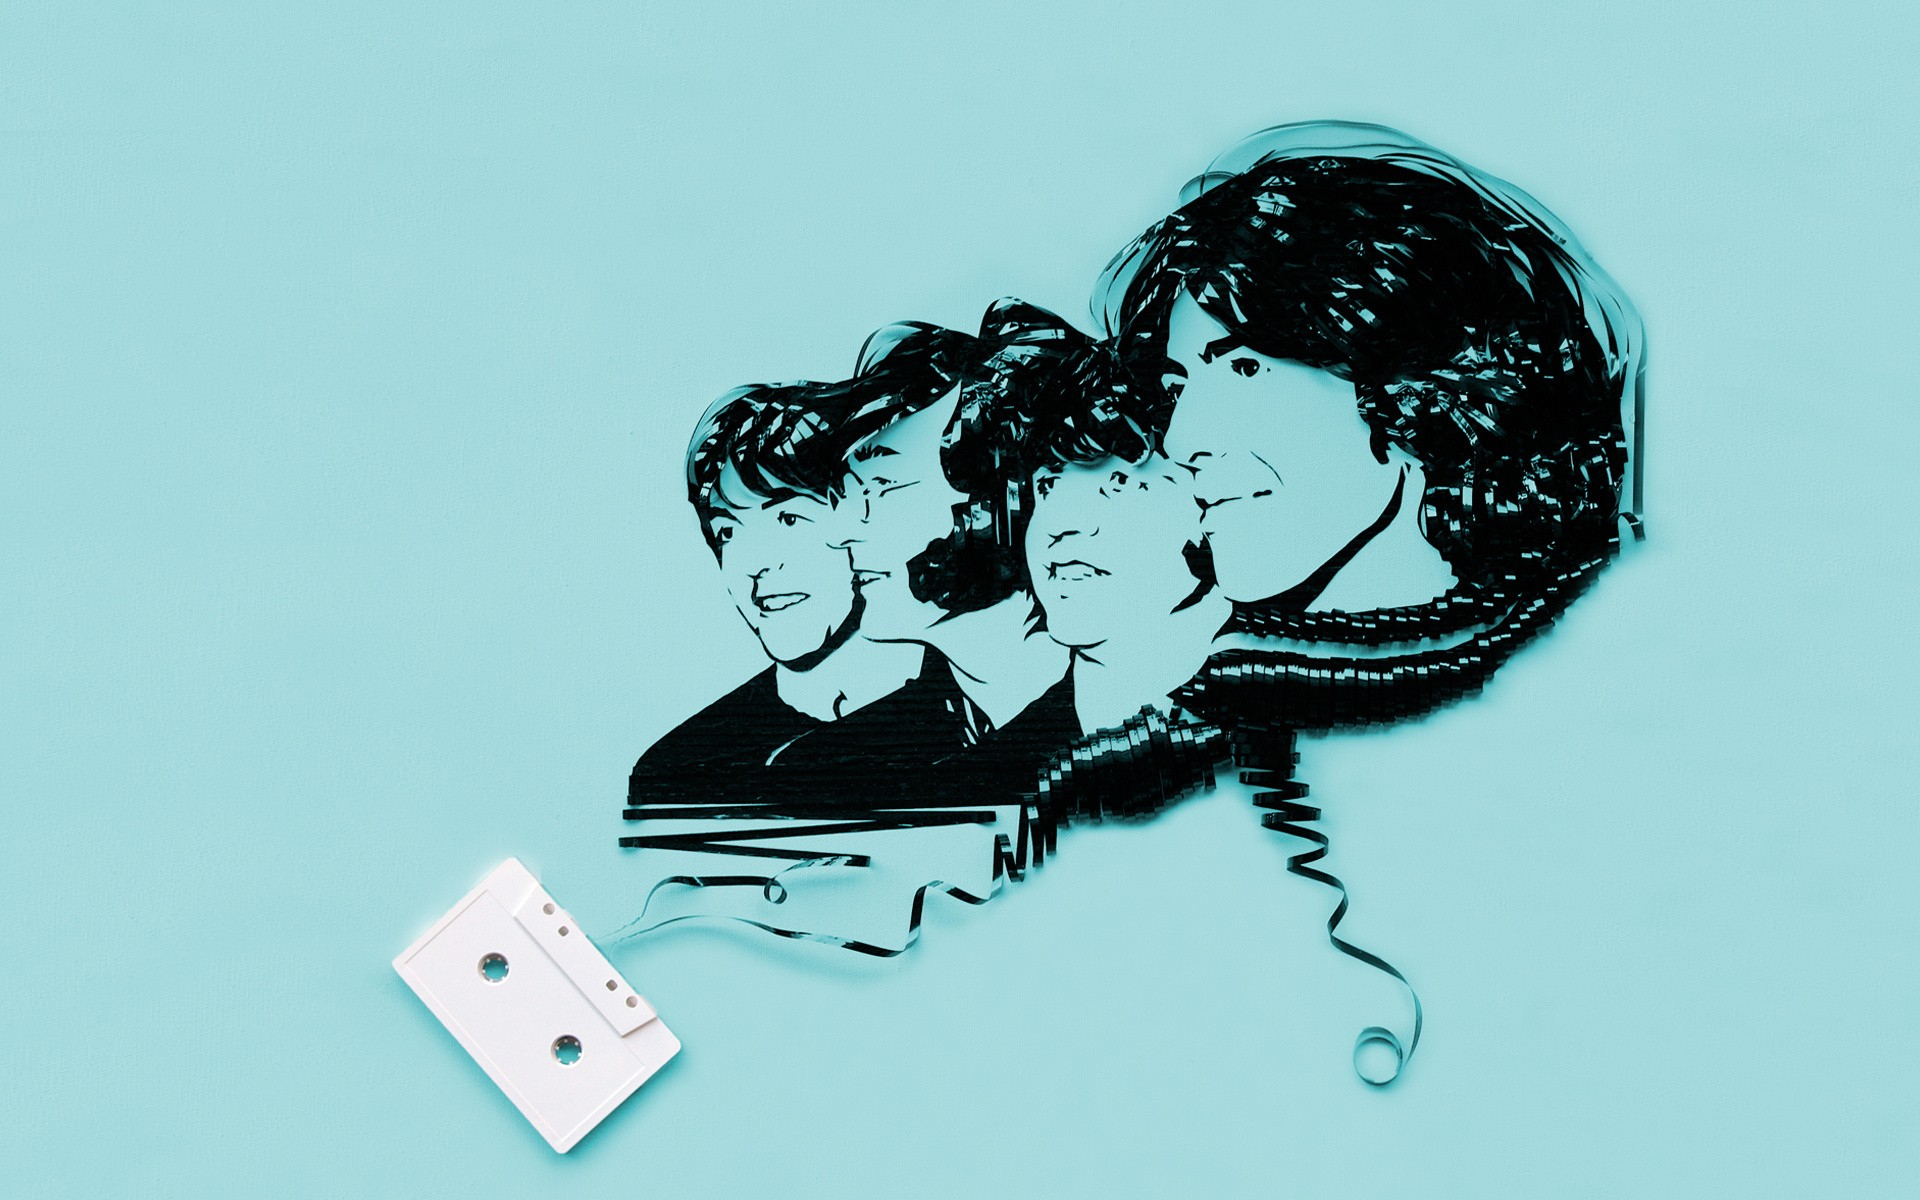 General 1920x1200 digital art minimalism simple simple background men face musician The Beatles tape audio cassete cassette John Lennon Paul McCartney legend Ringo Starr George Harrison singer artwork cyan cyan background